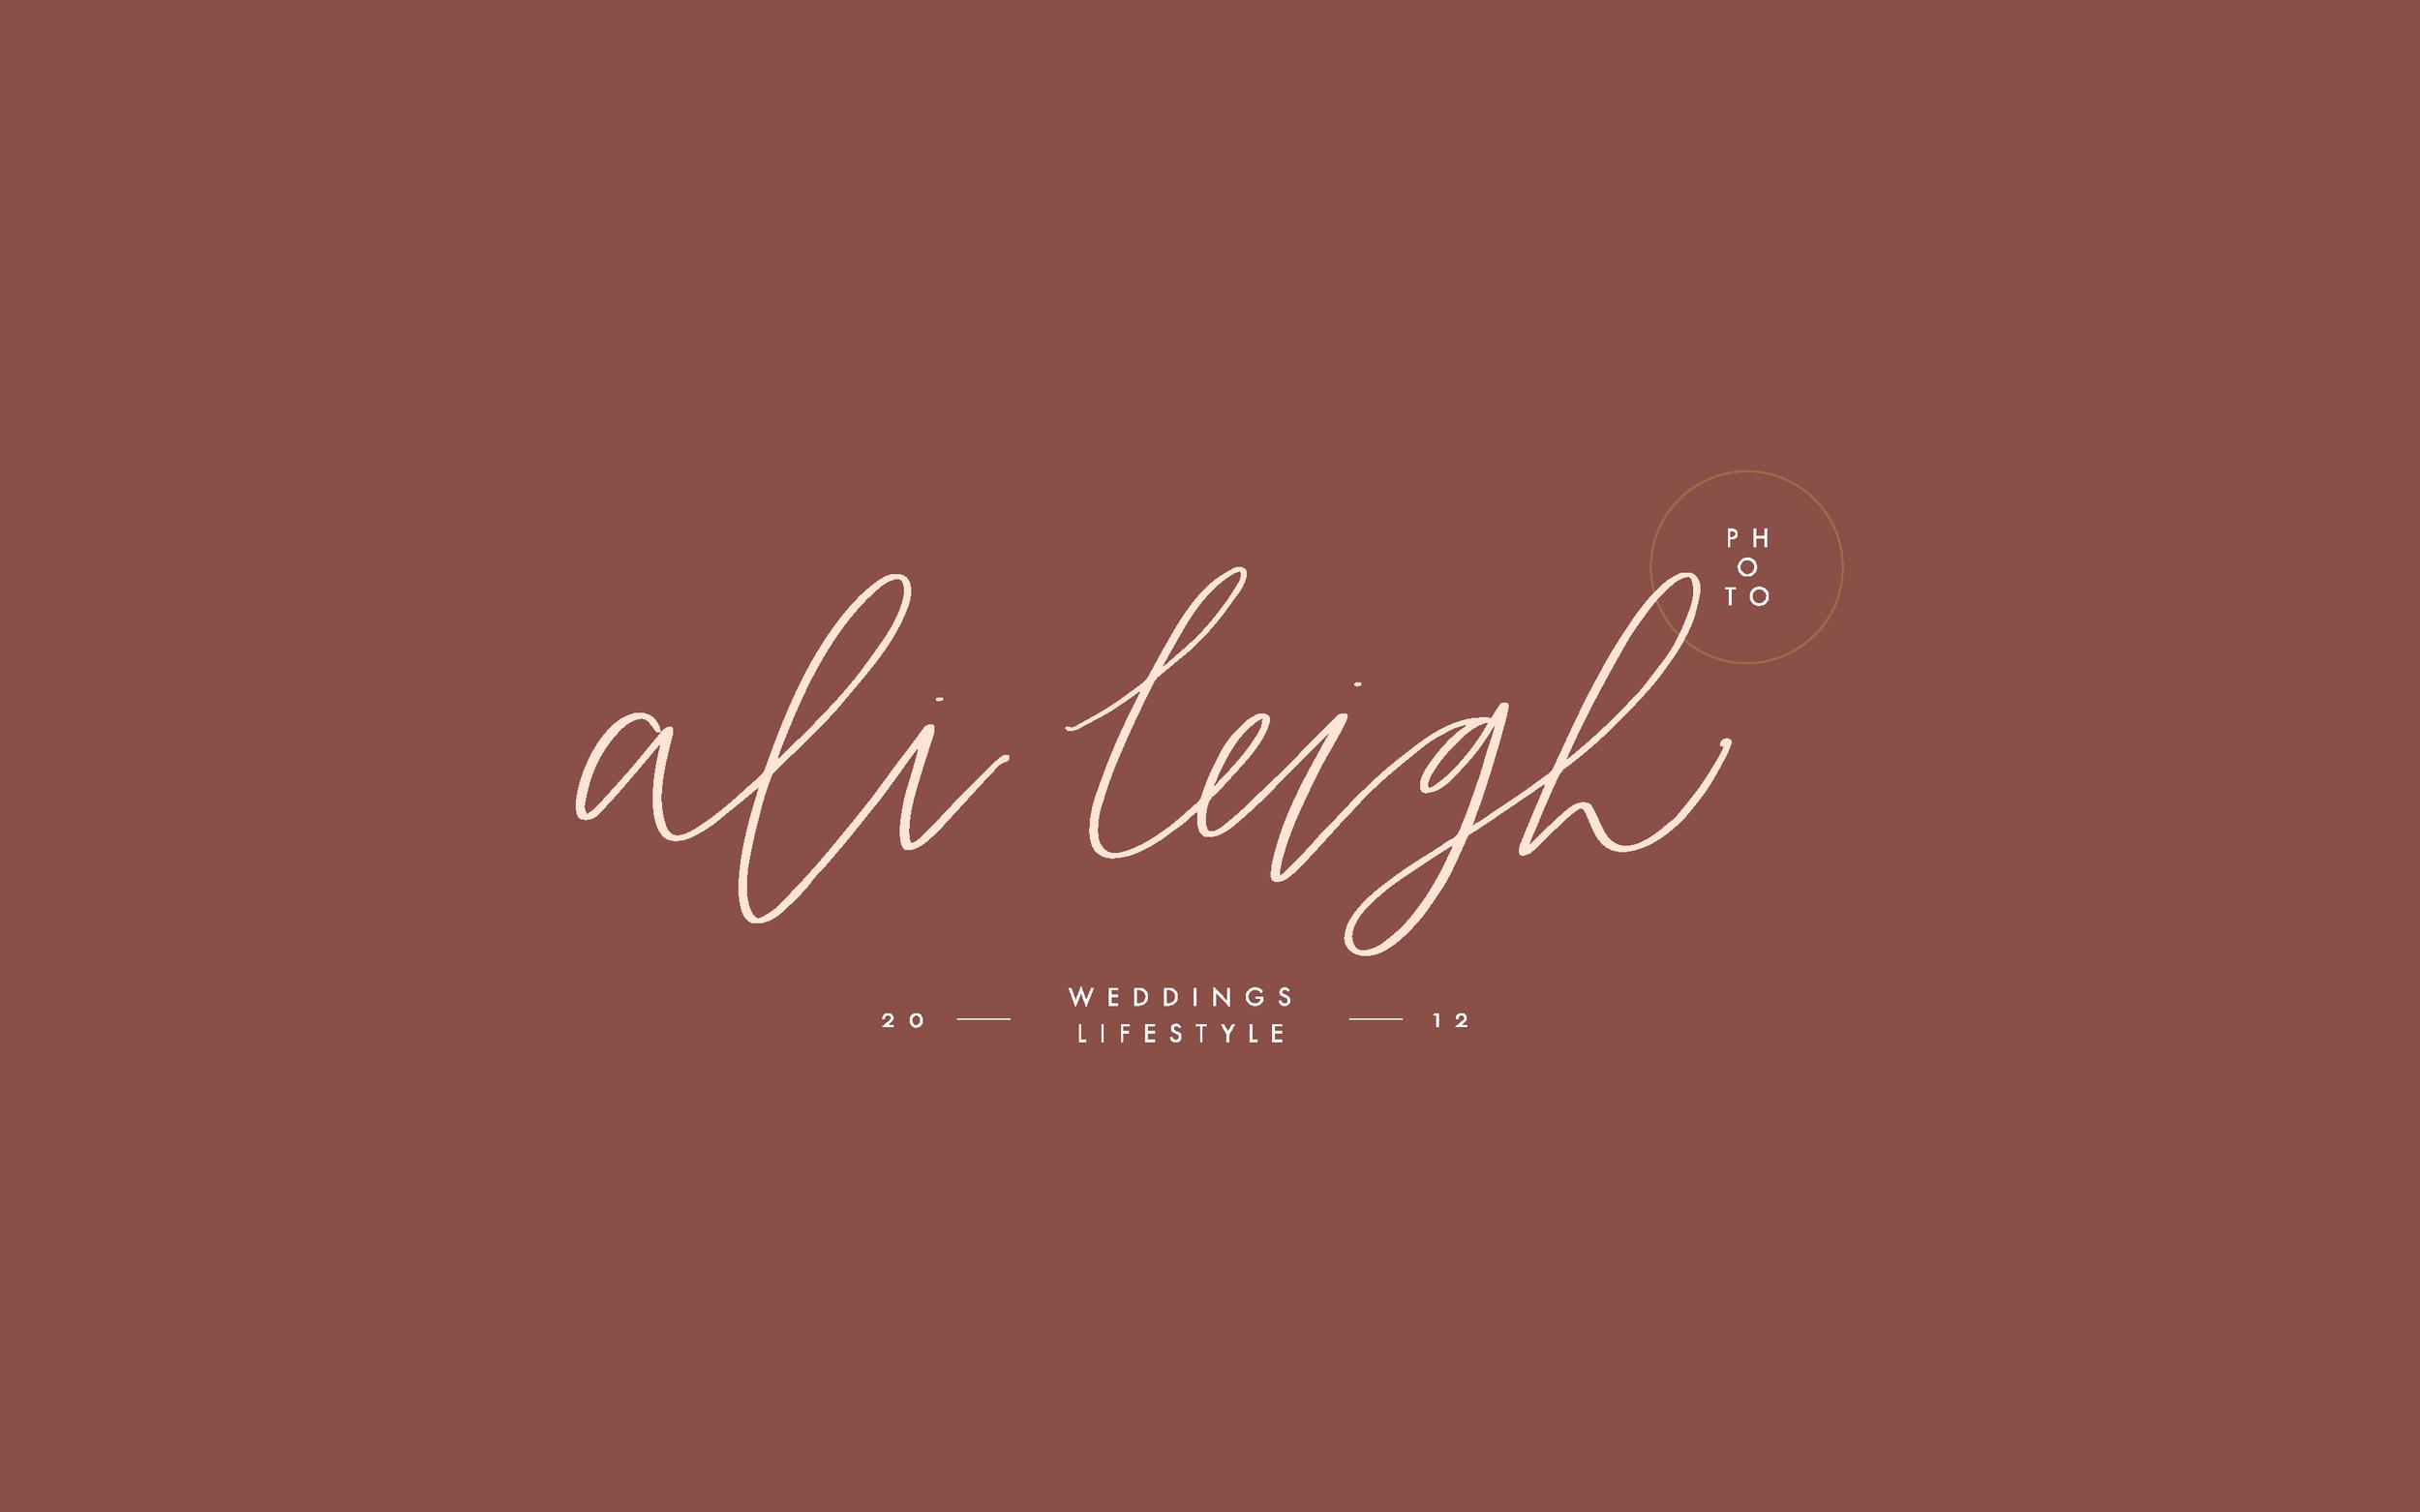 ali-leigh-photo-branding-logo-design-identity-handlettering.png